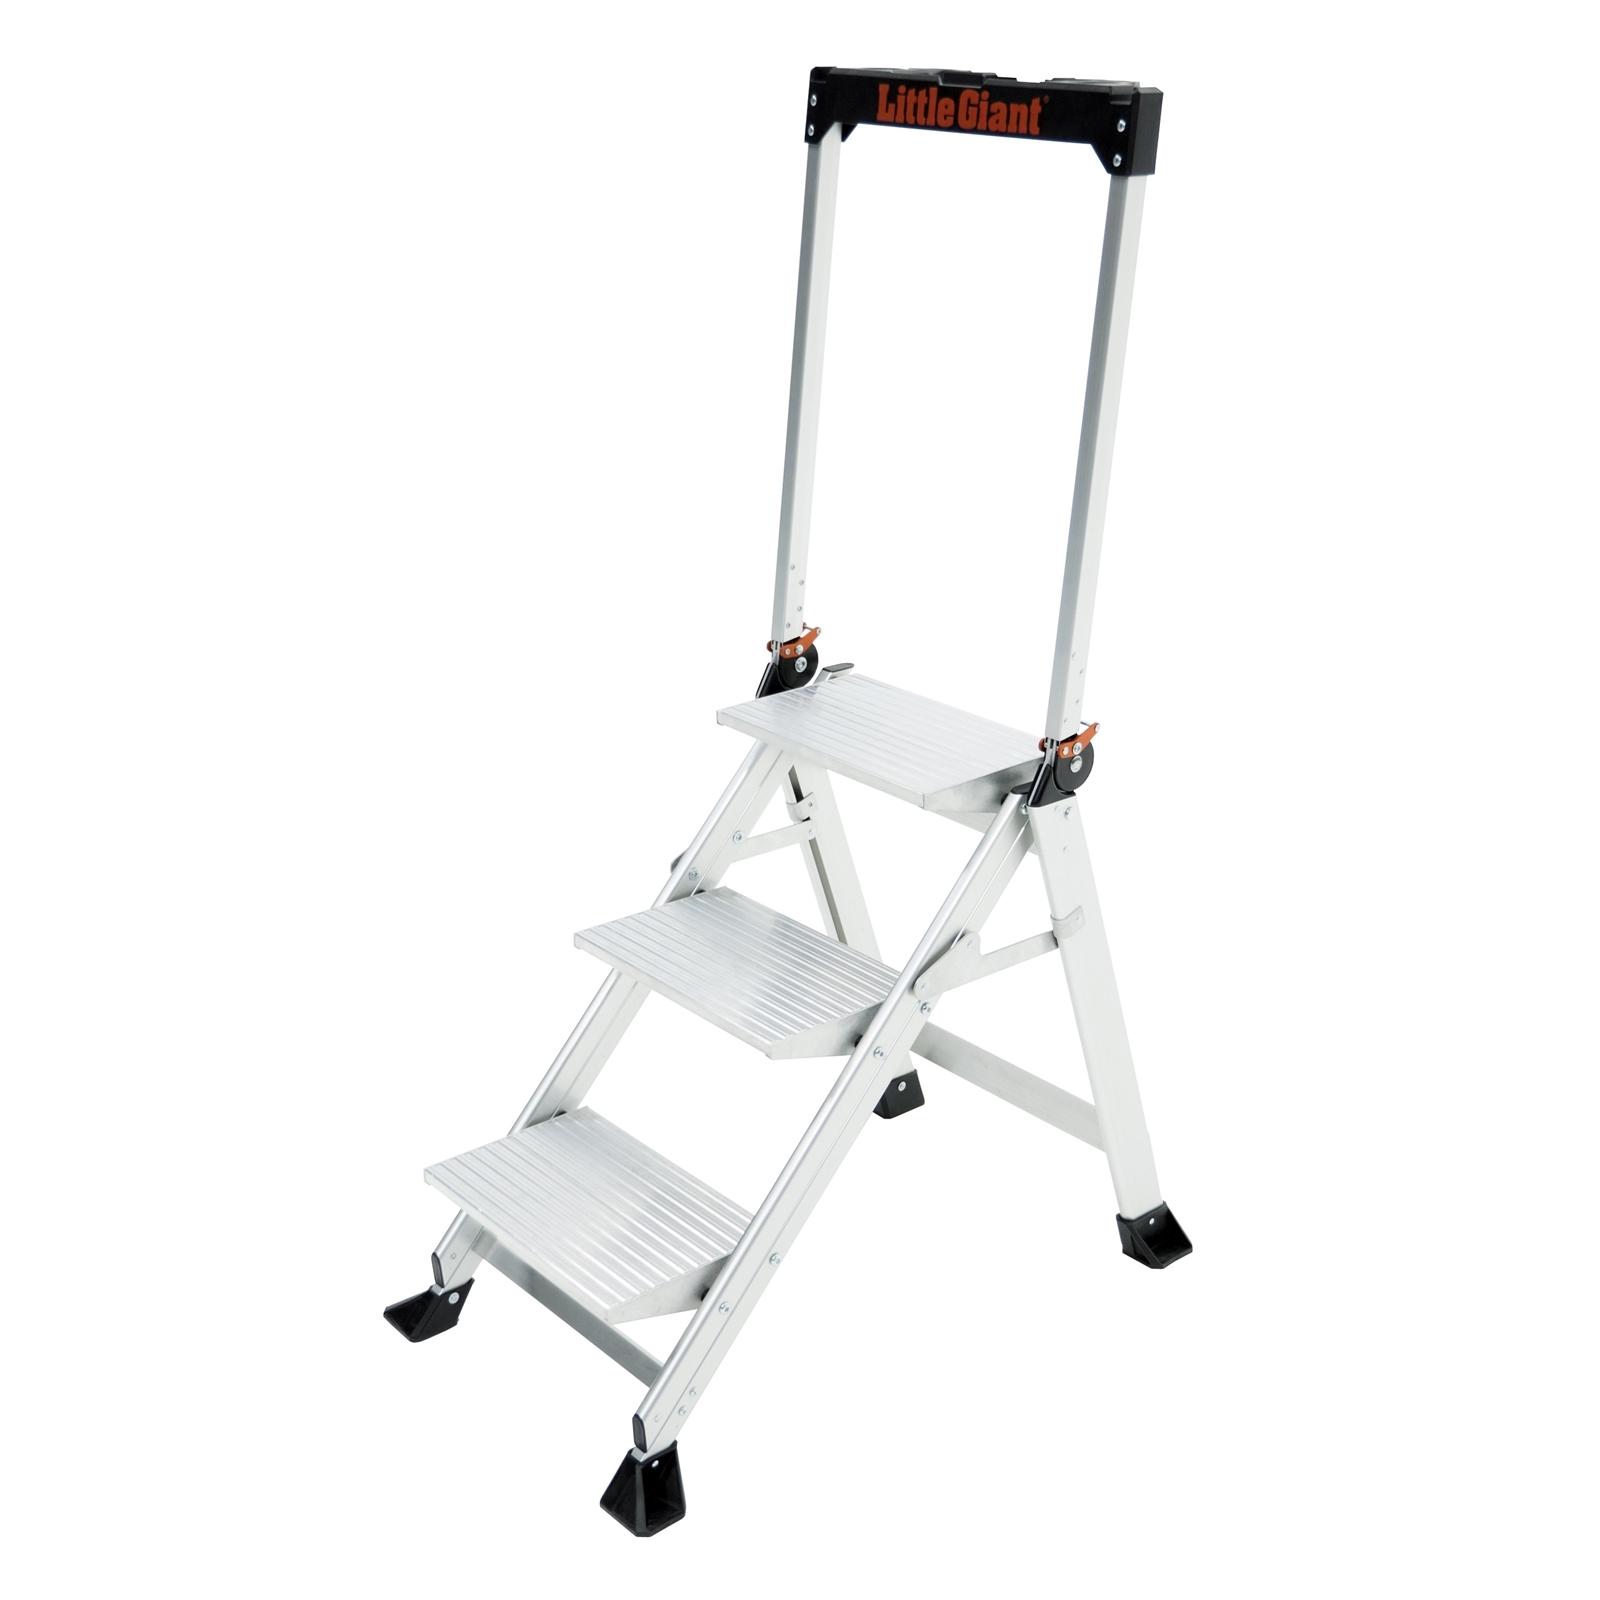 Little Giant Jumbo Step - 3 Step Ladder With Handrail